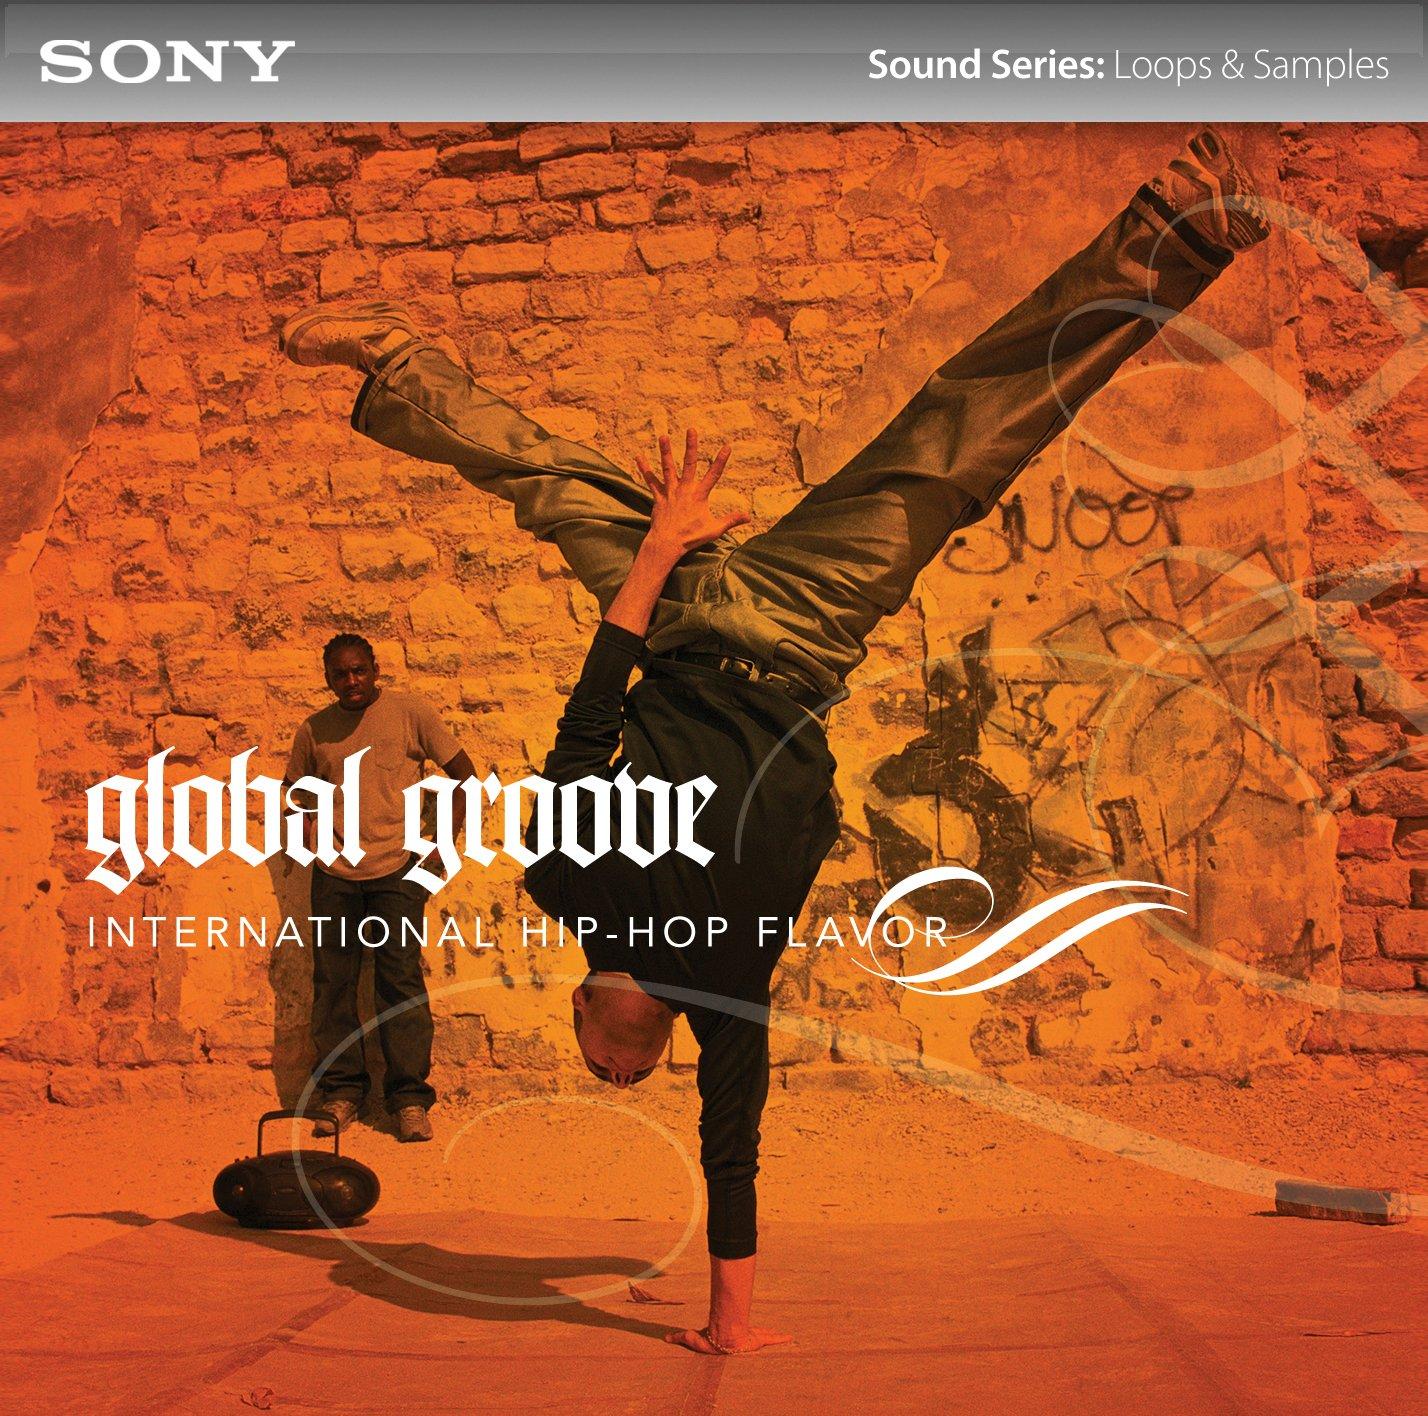 Global Groove: International Hip-Hop Flavor [Download] Sony Creative Software DLC73